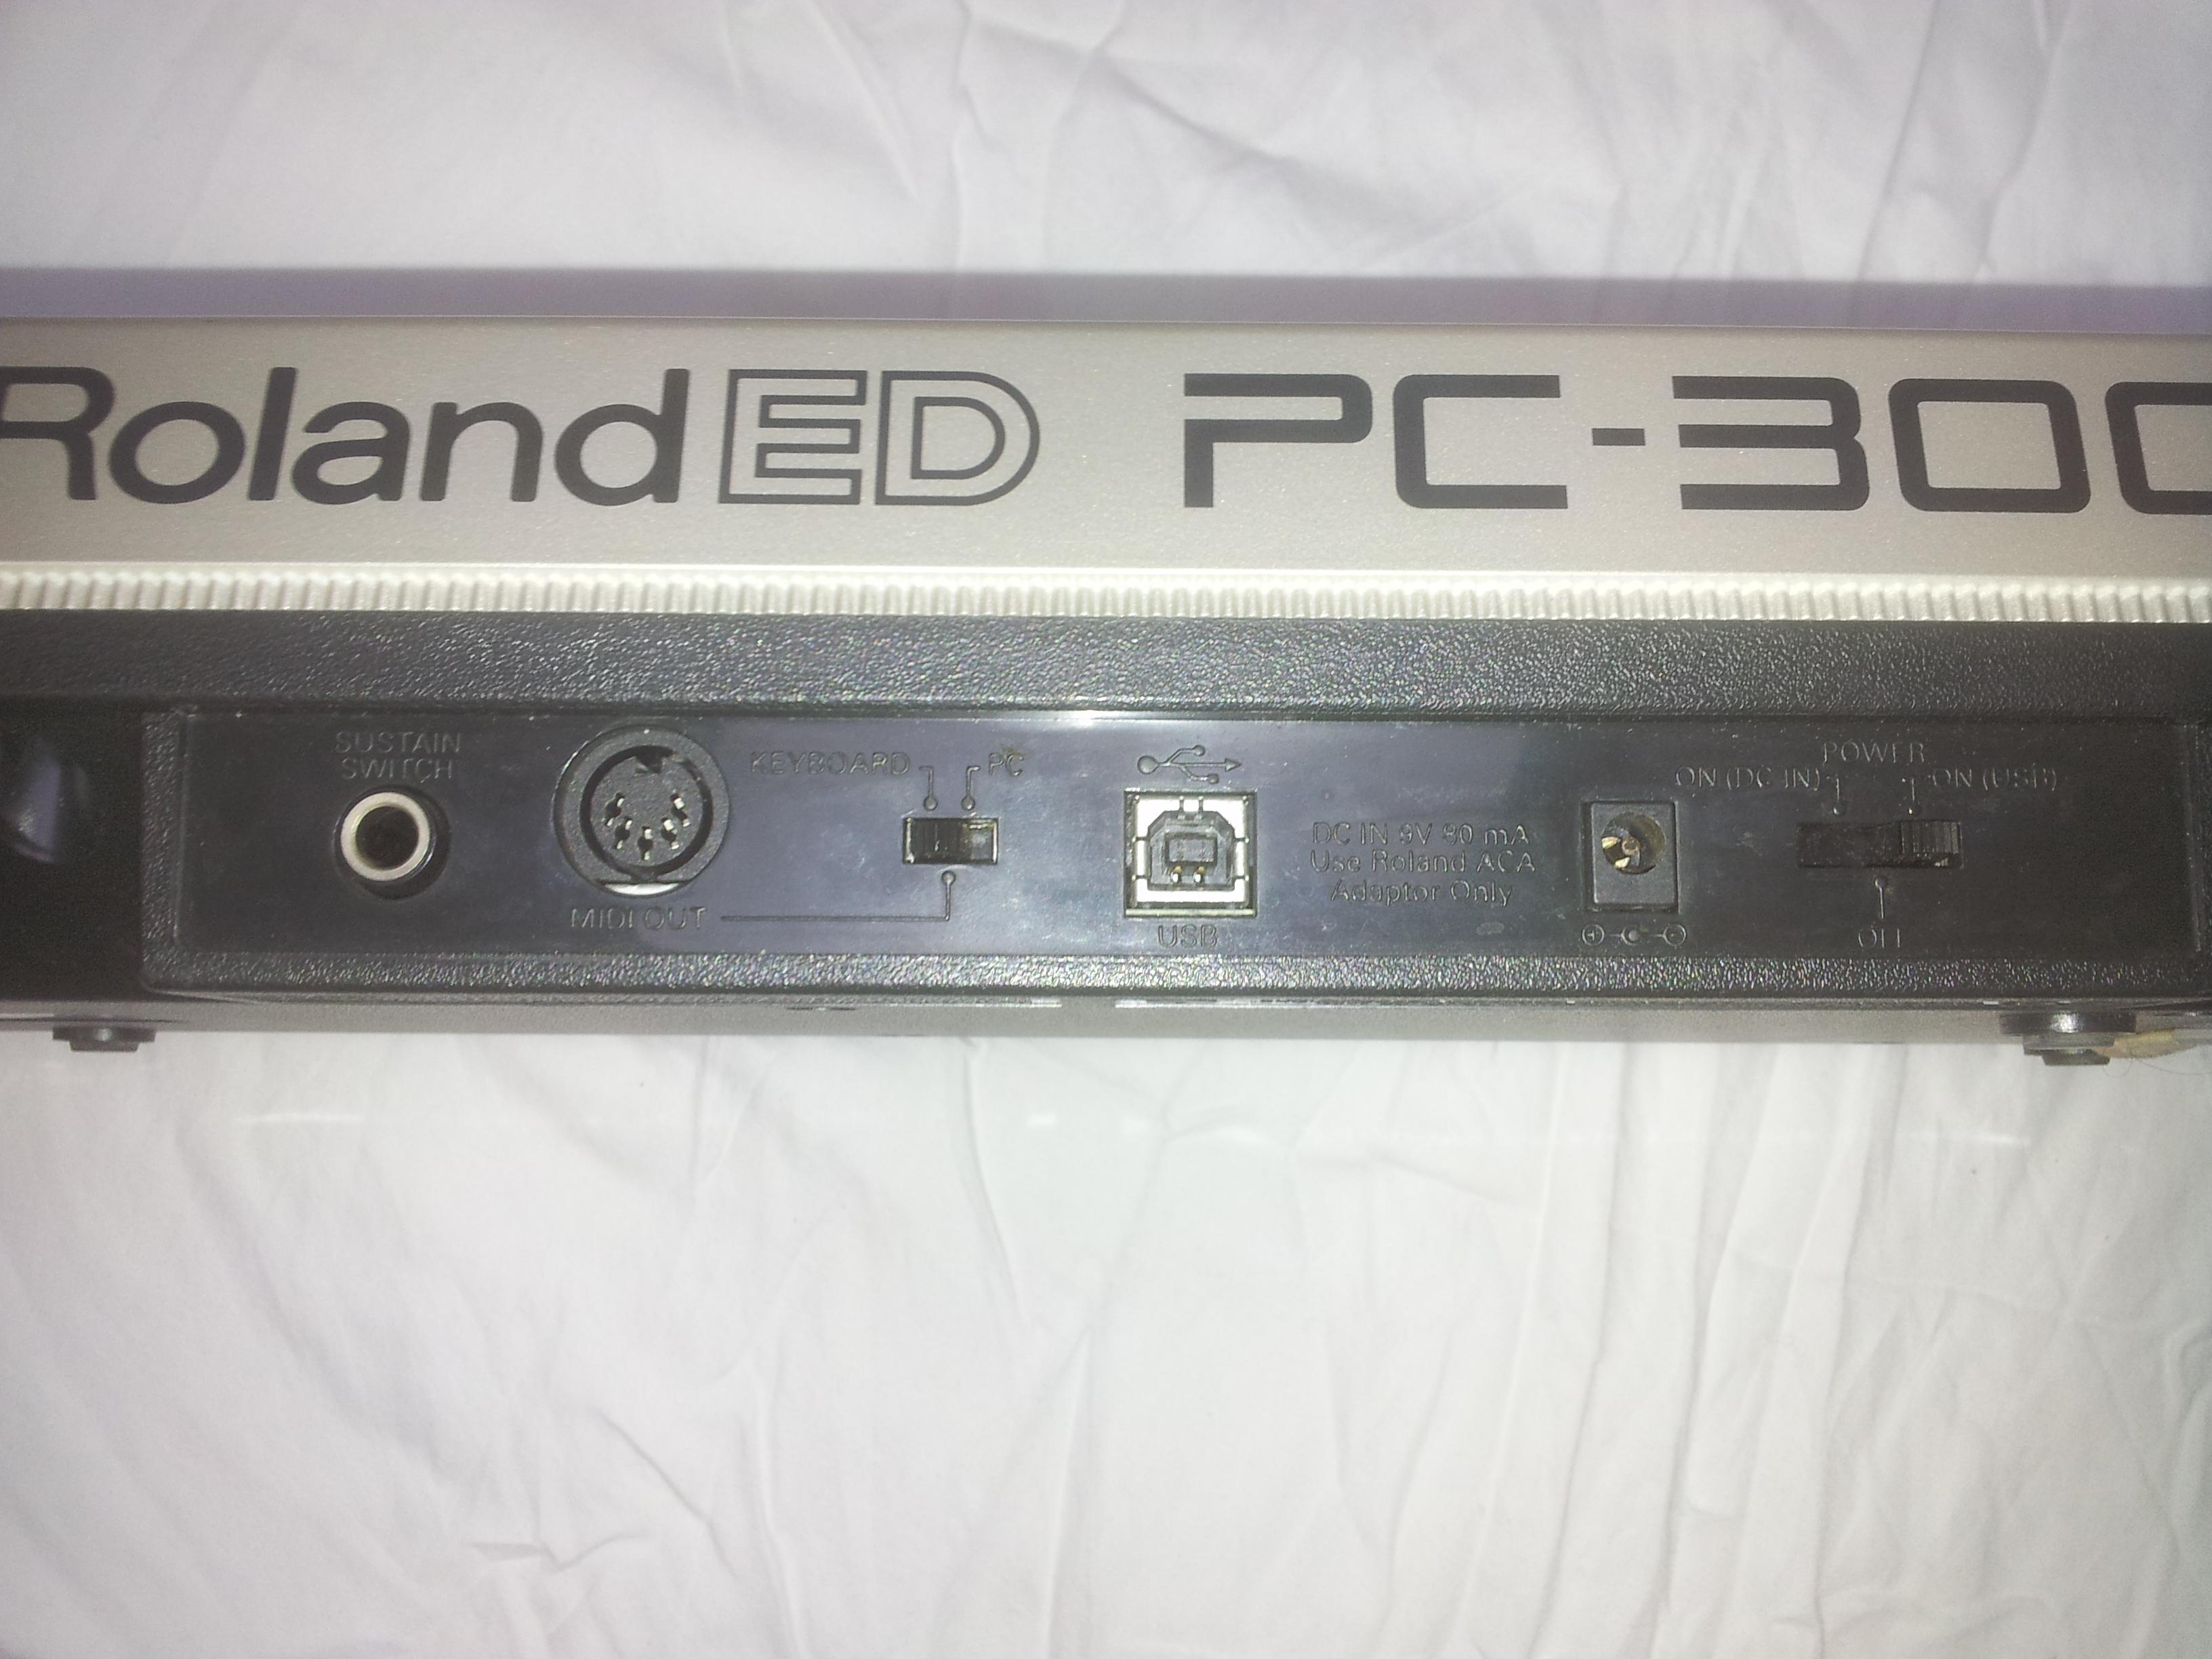 Roland pc-300 driver mac.